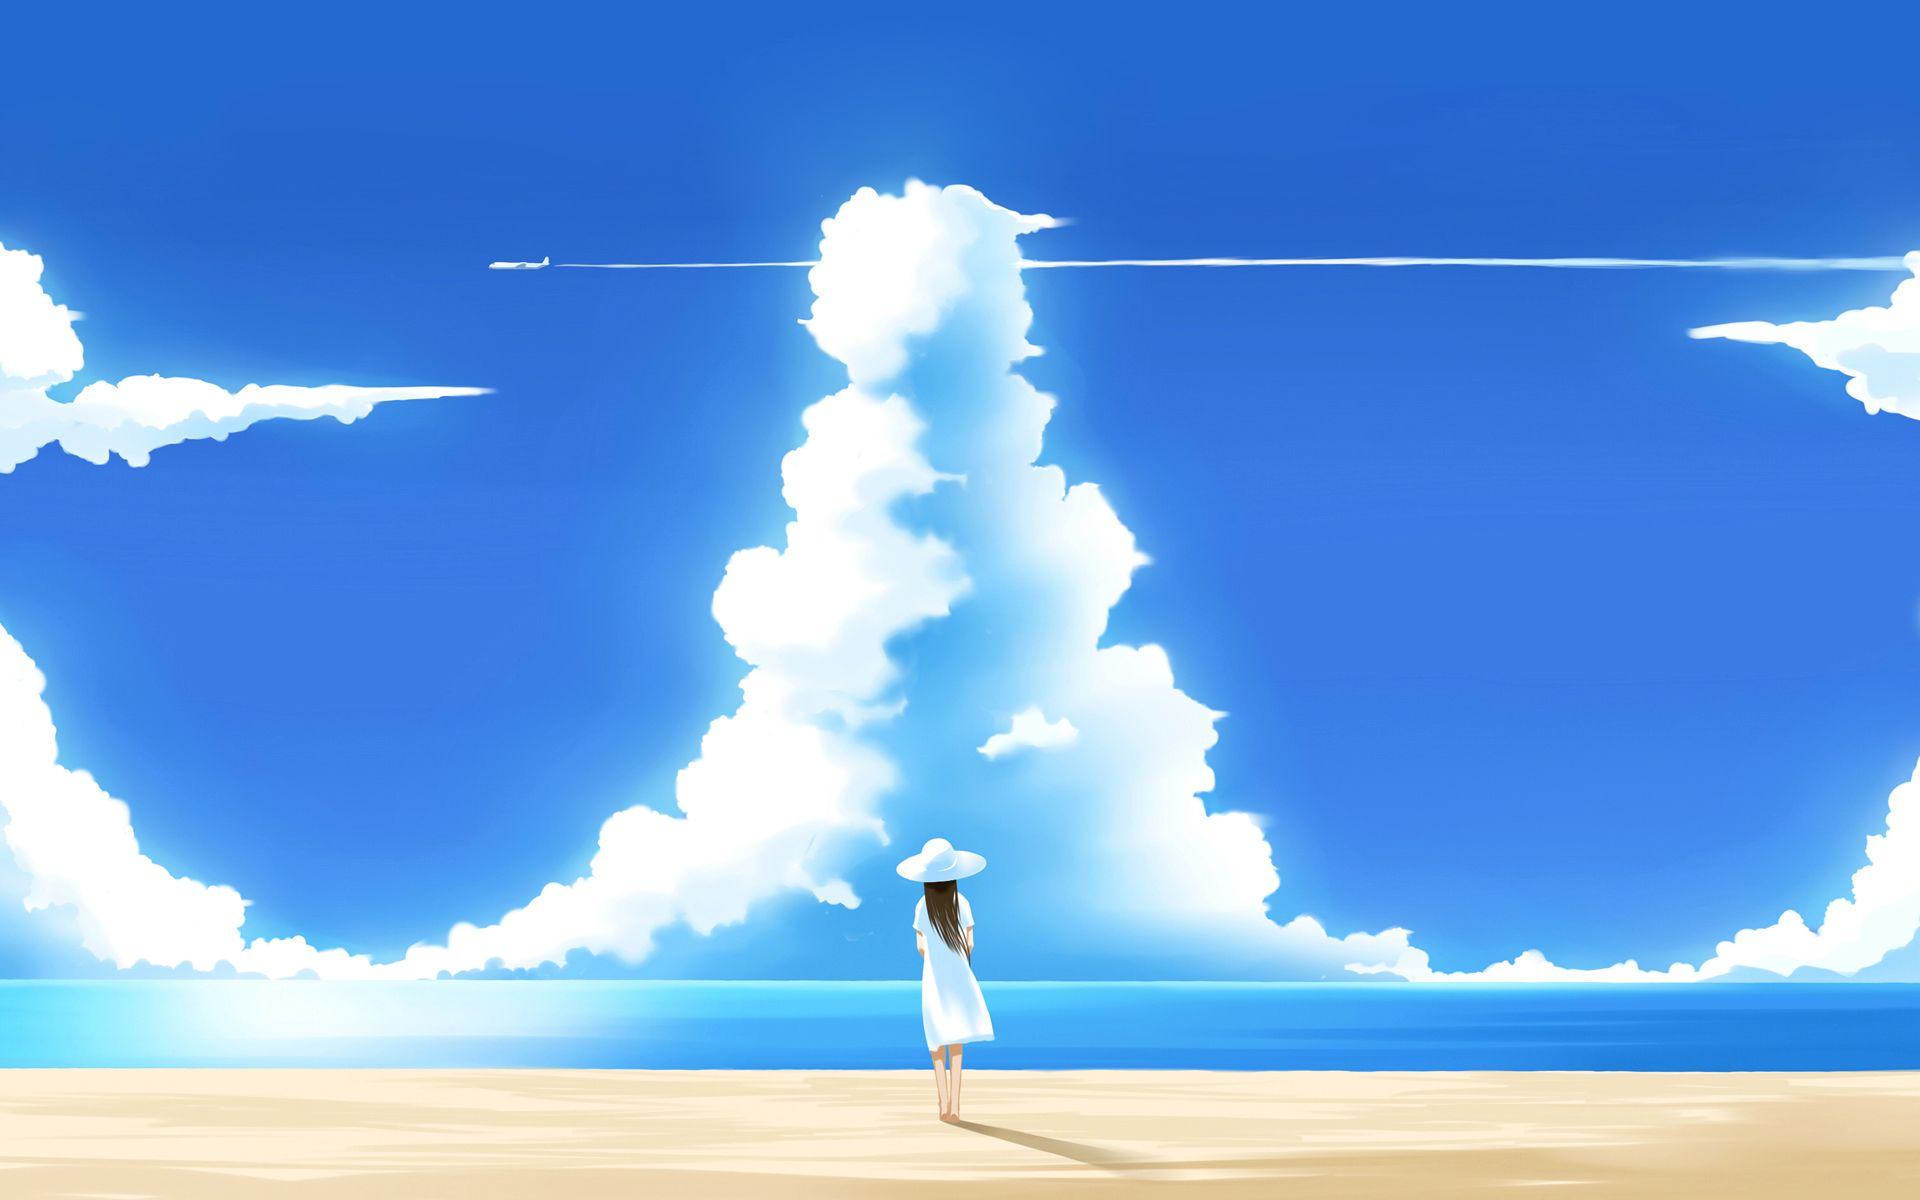 Wallpaper sky blue background